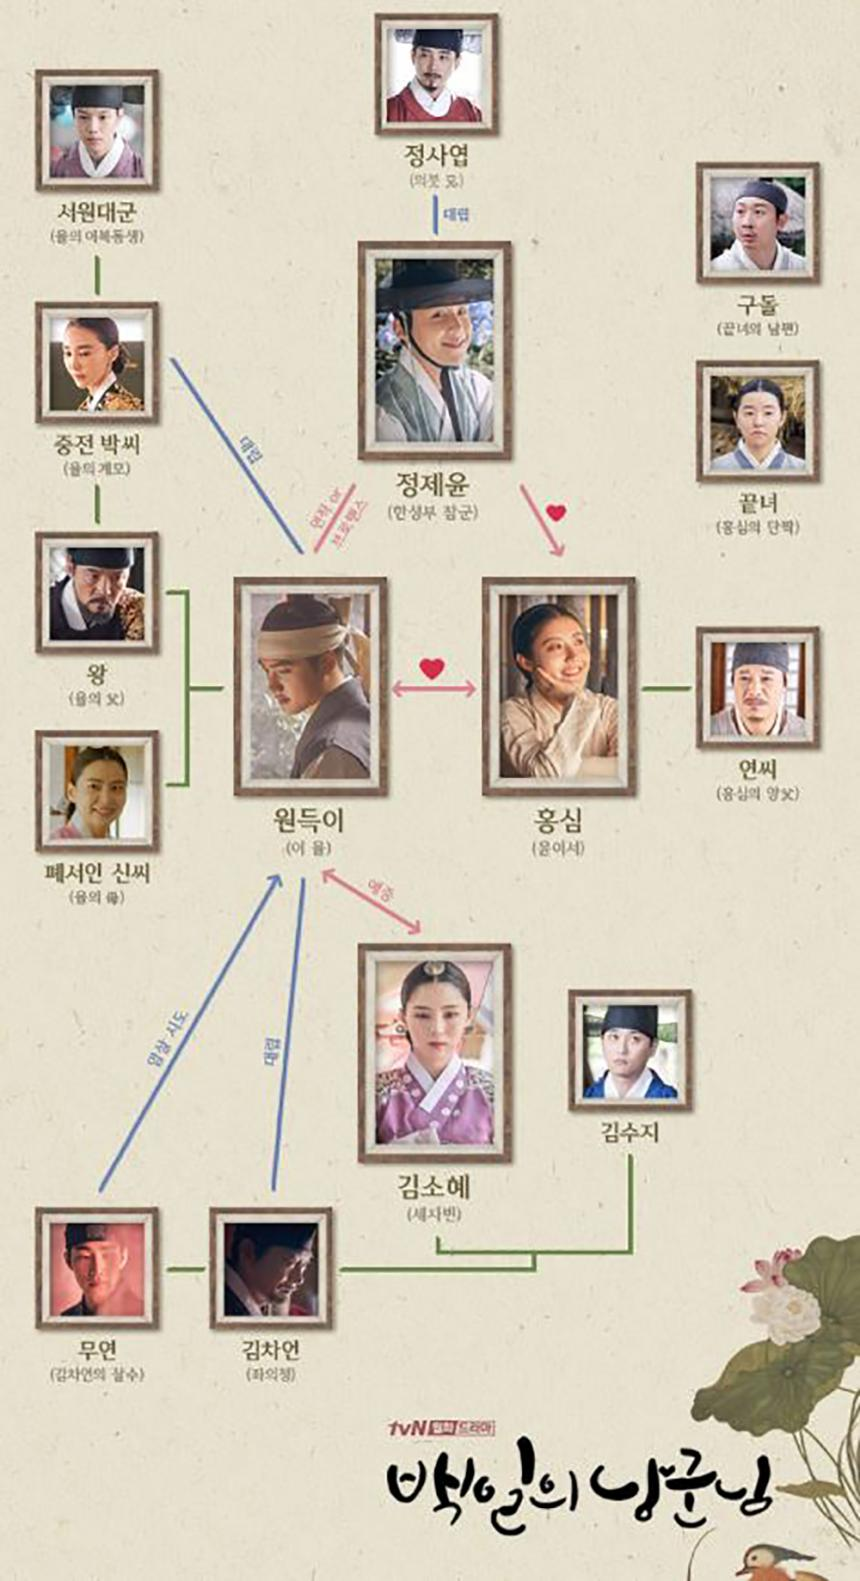 tvN 월화드라마 '백일의 낭군님' 인물관계도